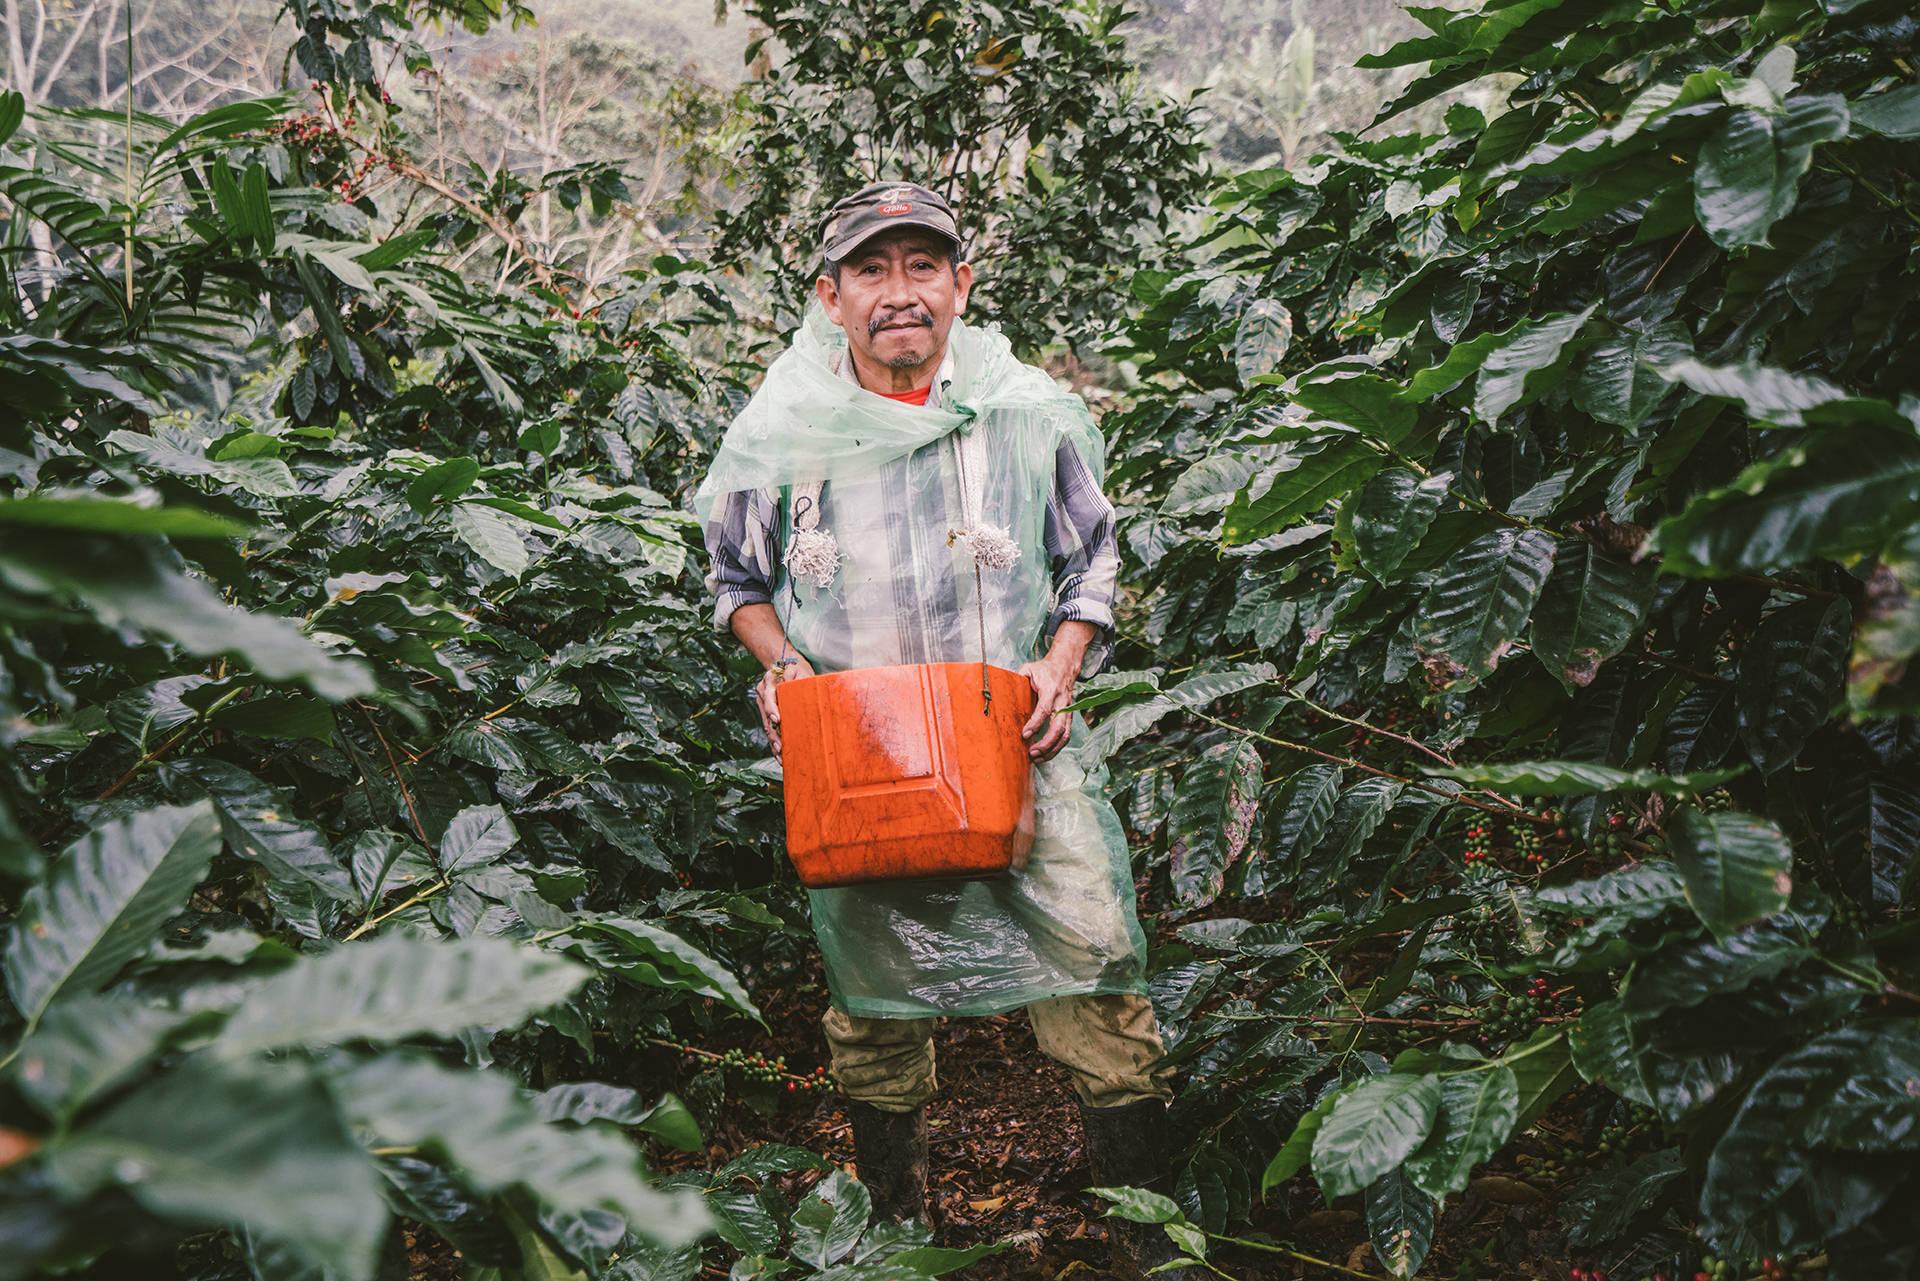 kaffee-bohne-plantage-ernte